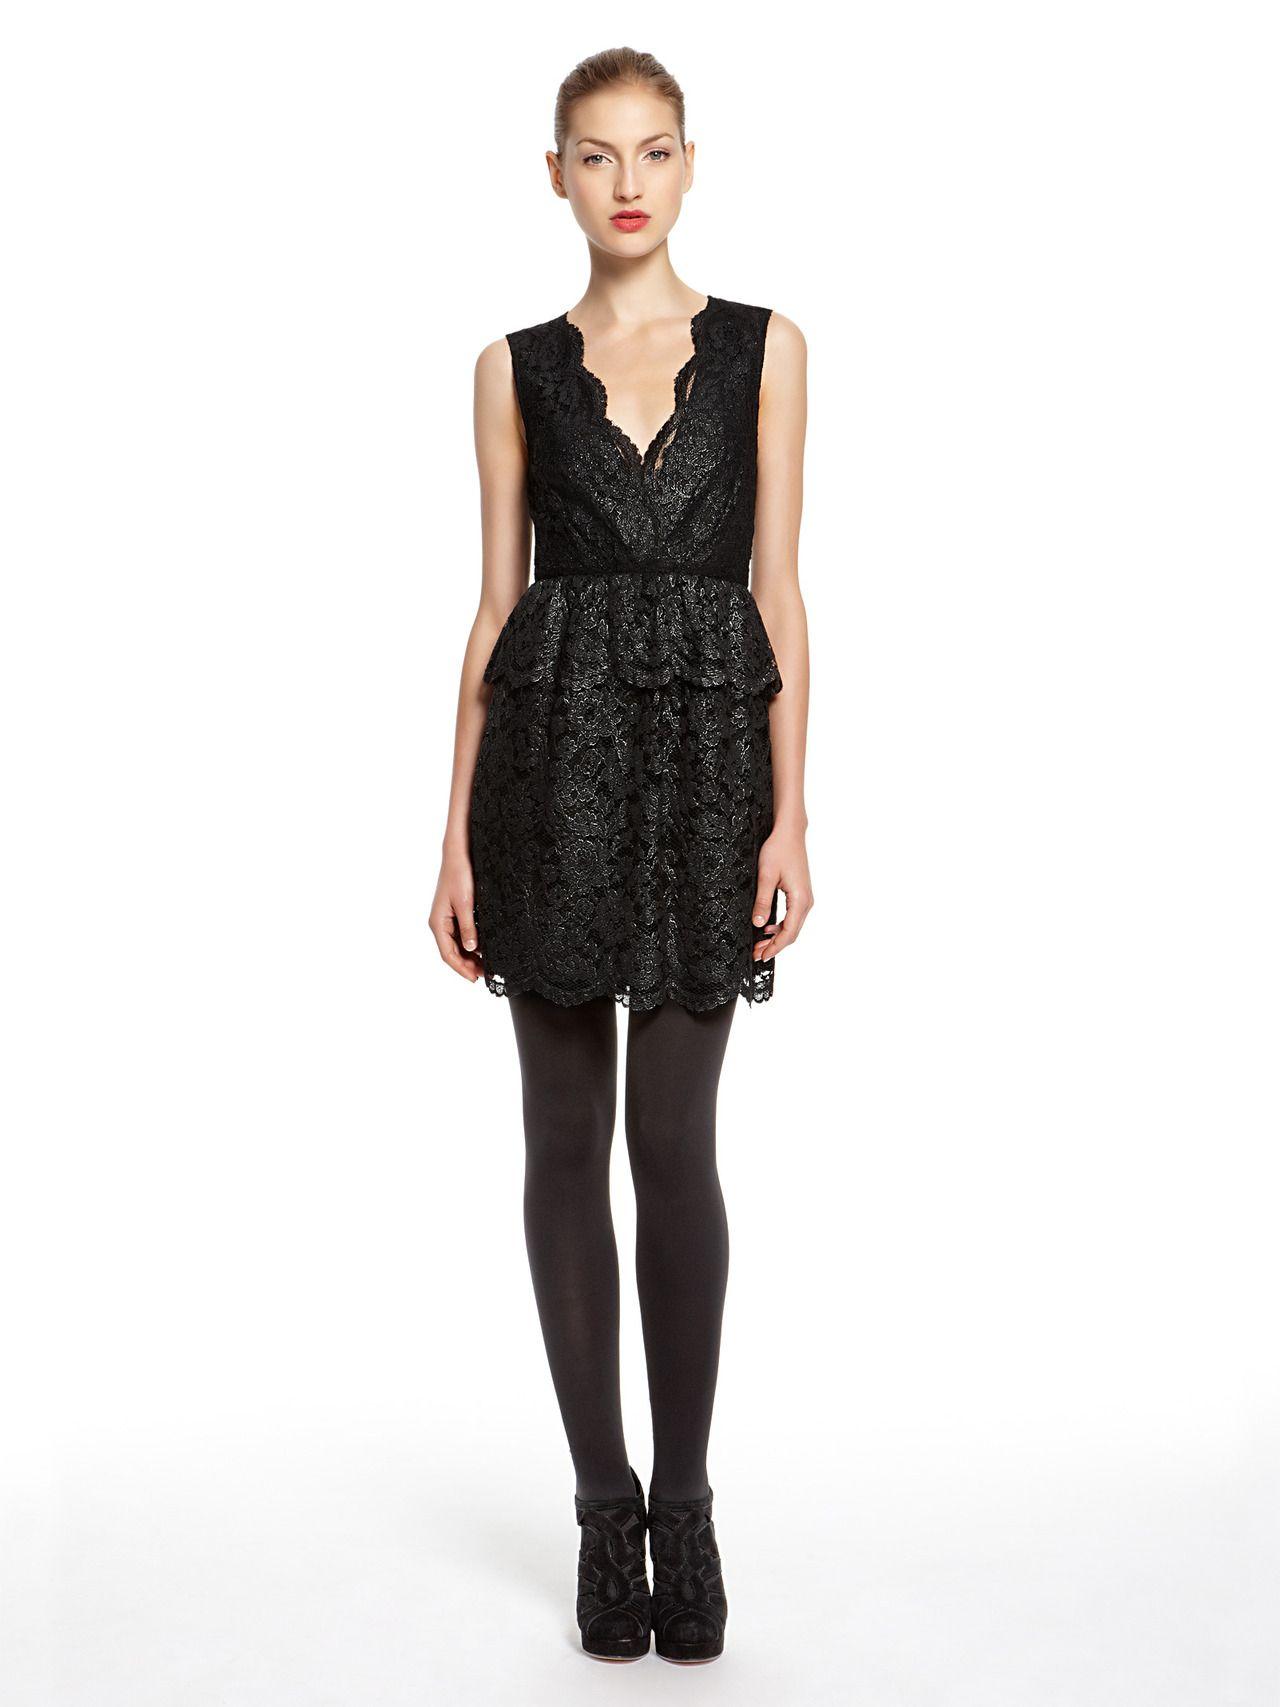 V neck black lace dress  DKNY lace dress  Fashion  Pinterest  Lace dress and Fashion